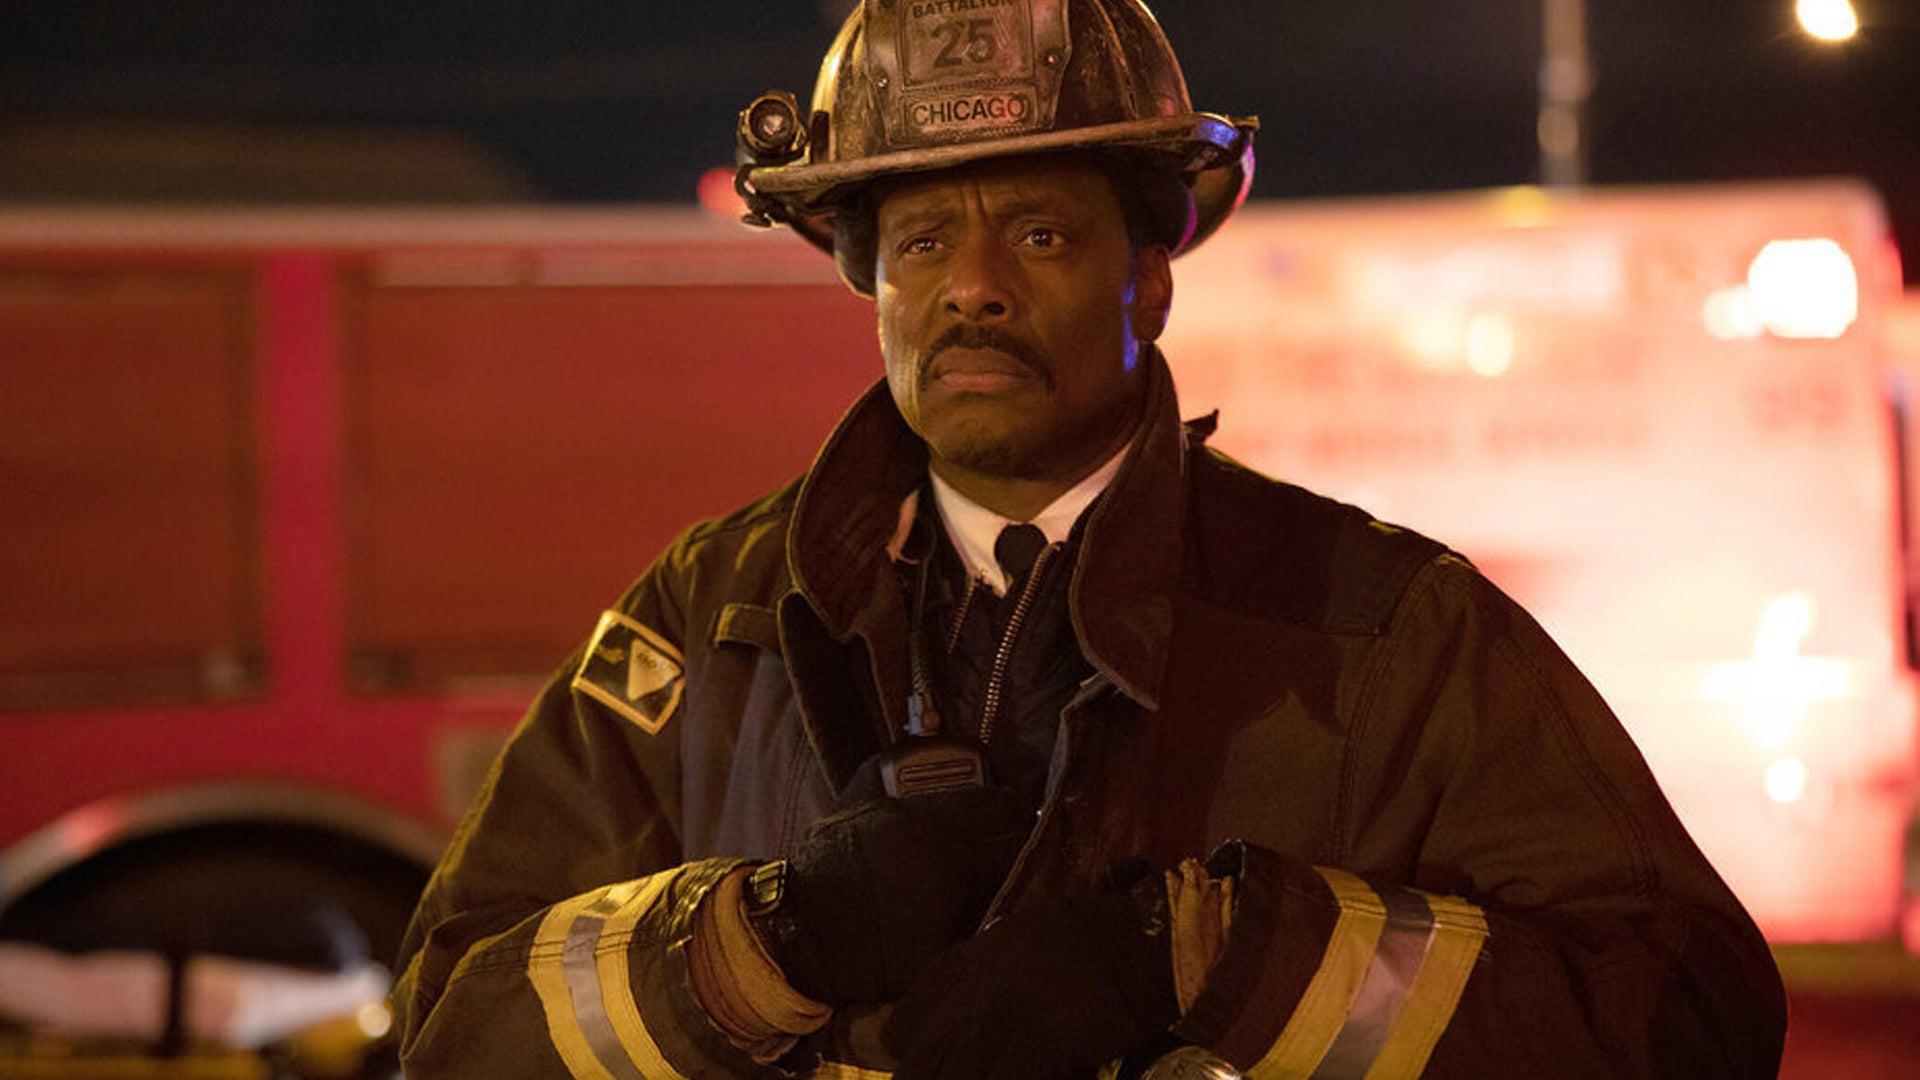 Eamonn Walker, Chicago Fire